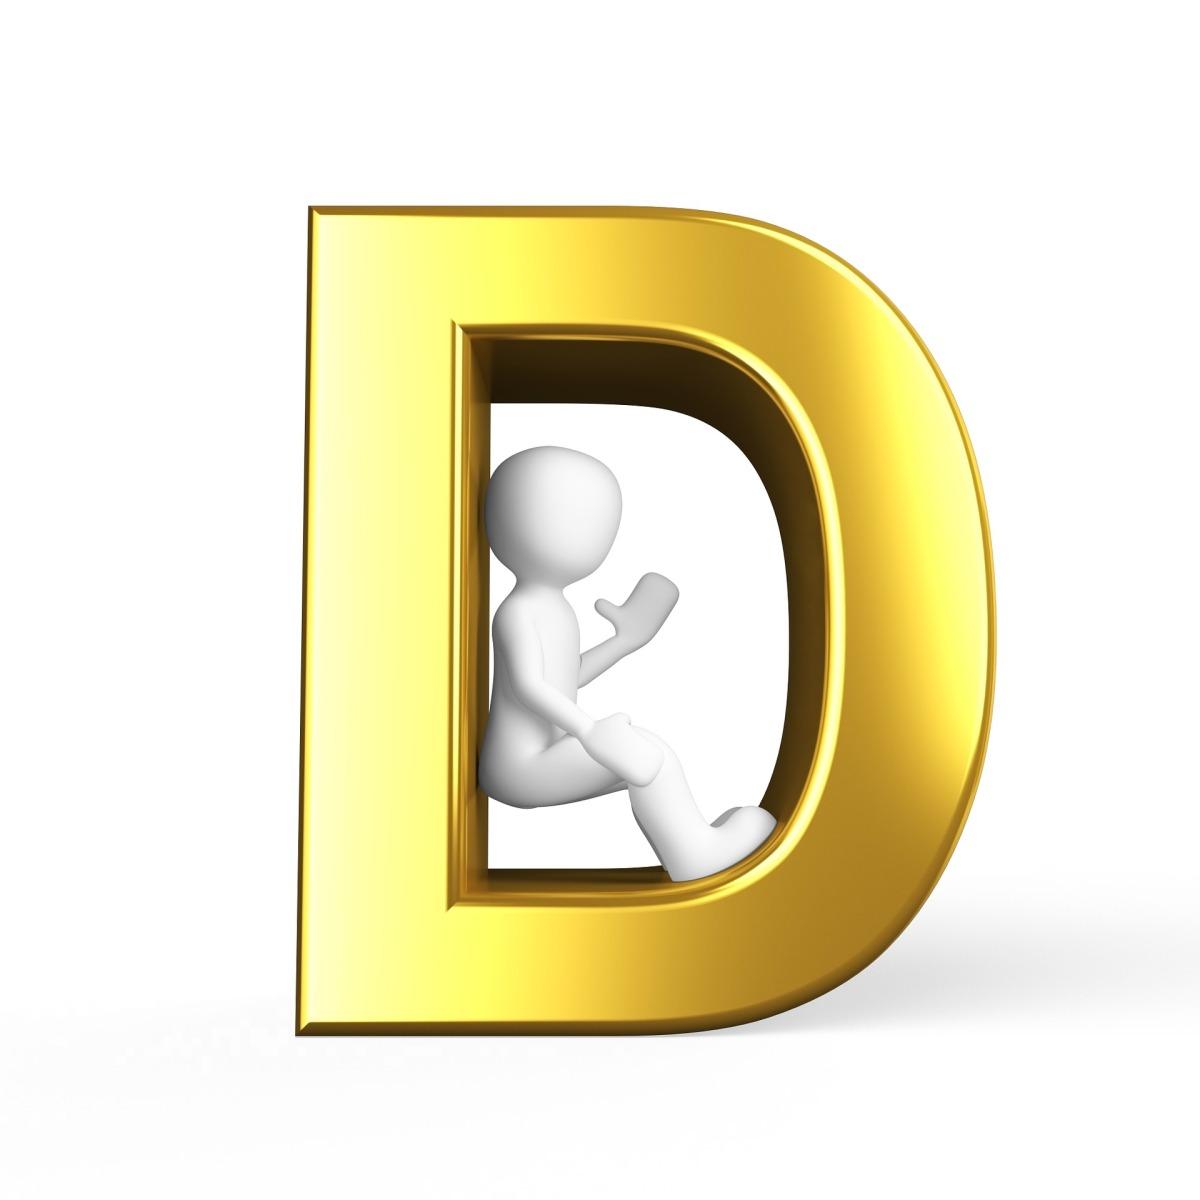 D is for DuranDuran